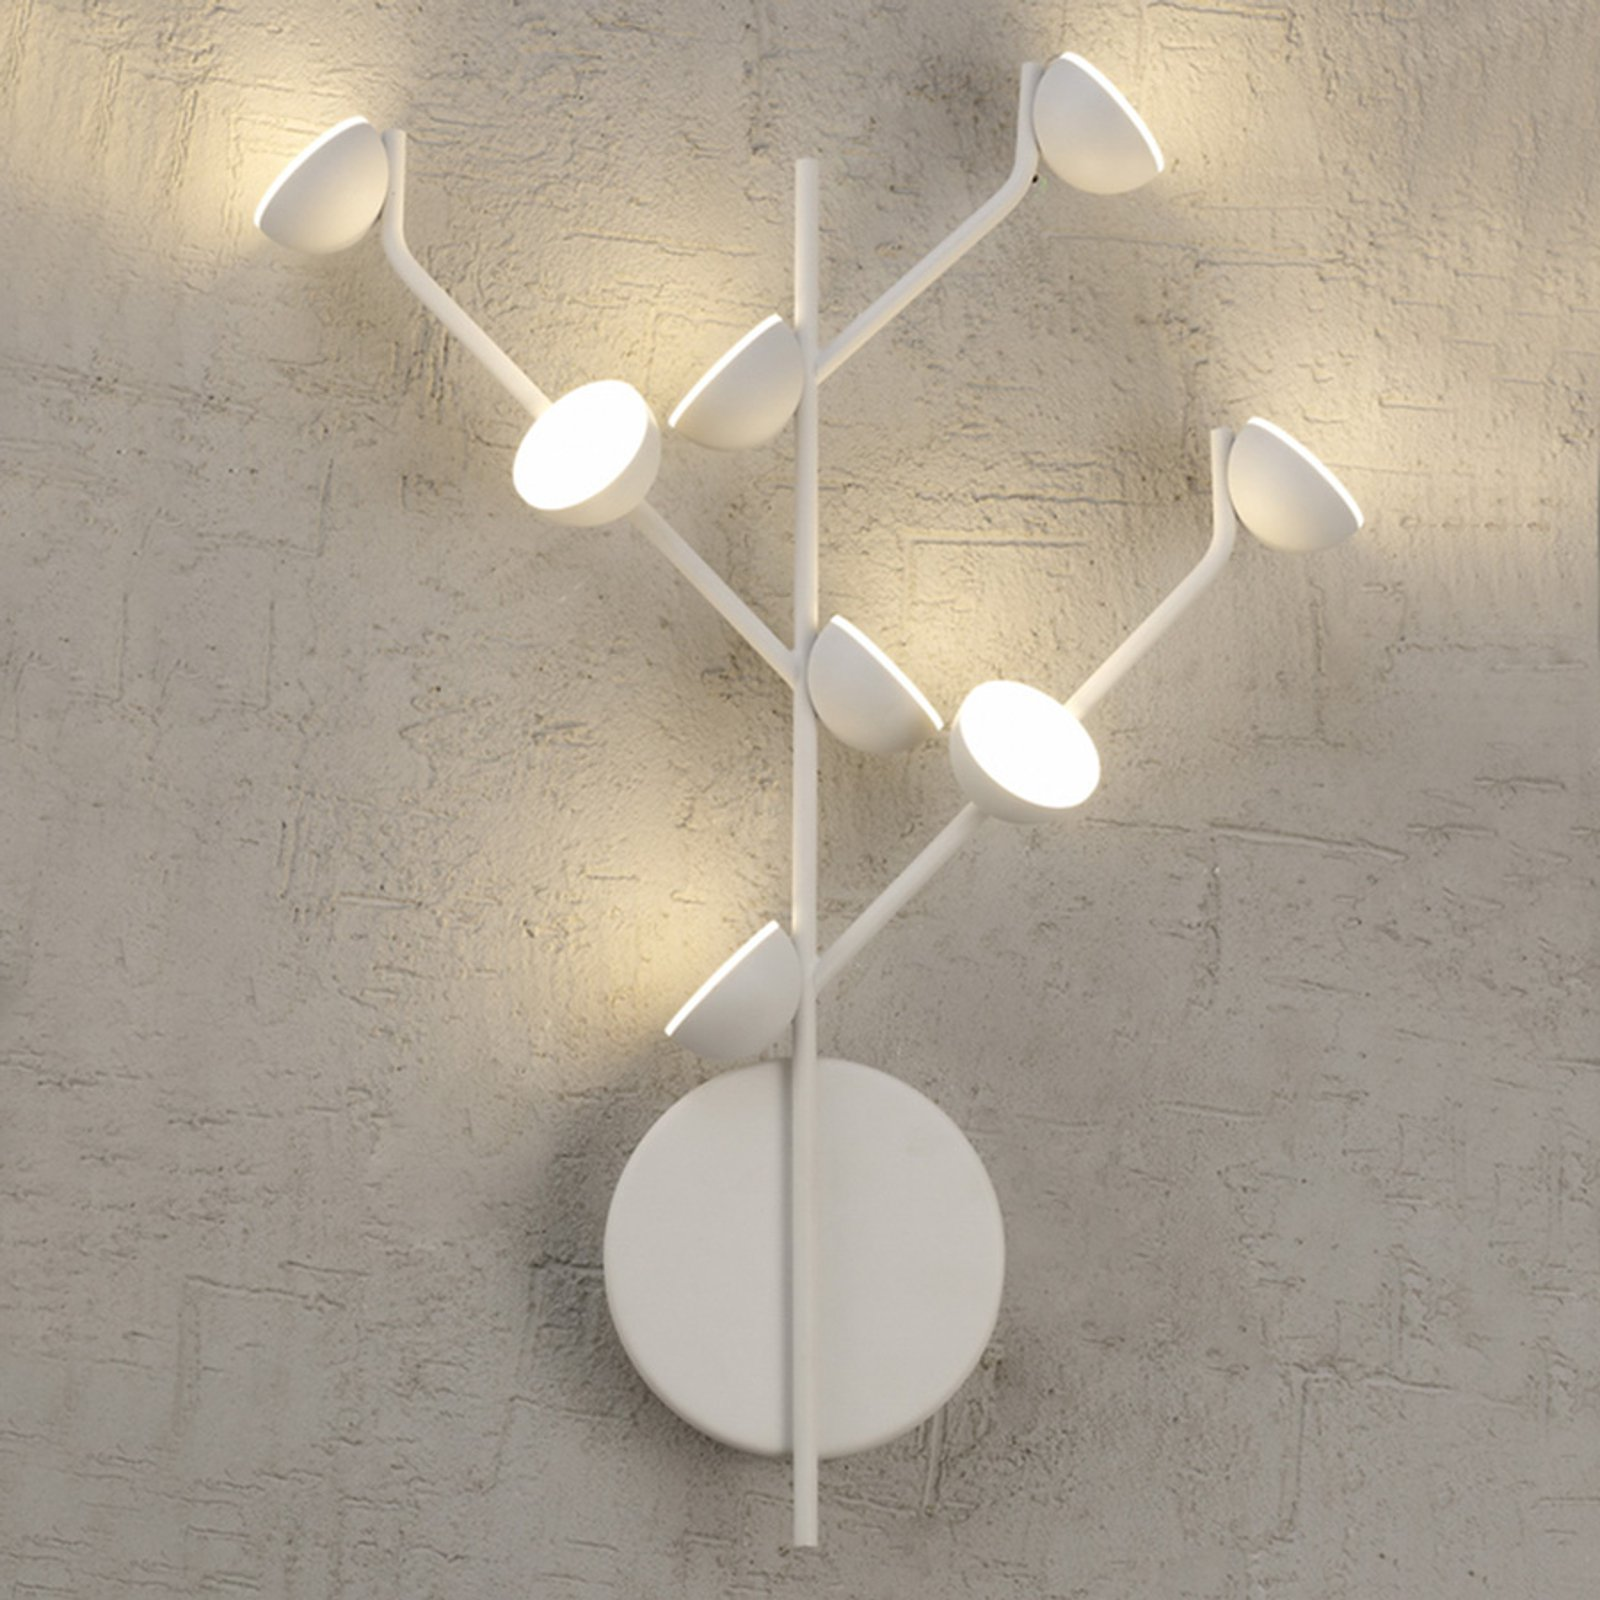 Adn LED-vegglampe 8 lyskilder